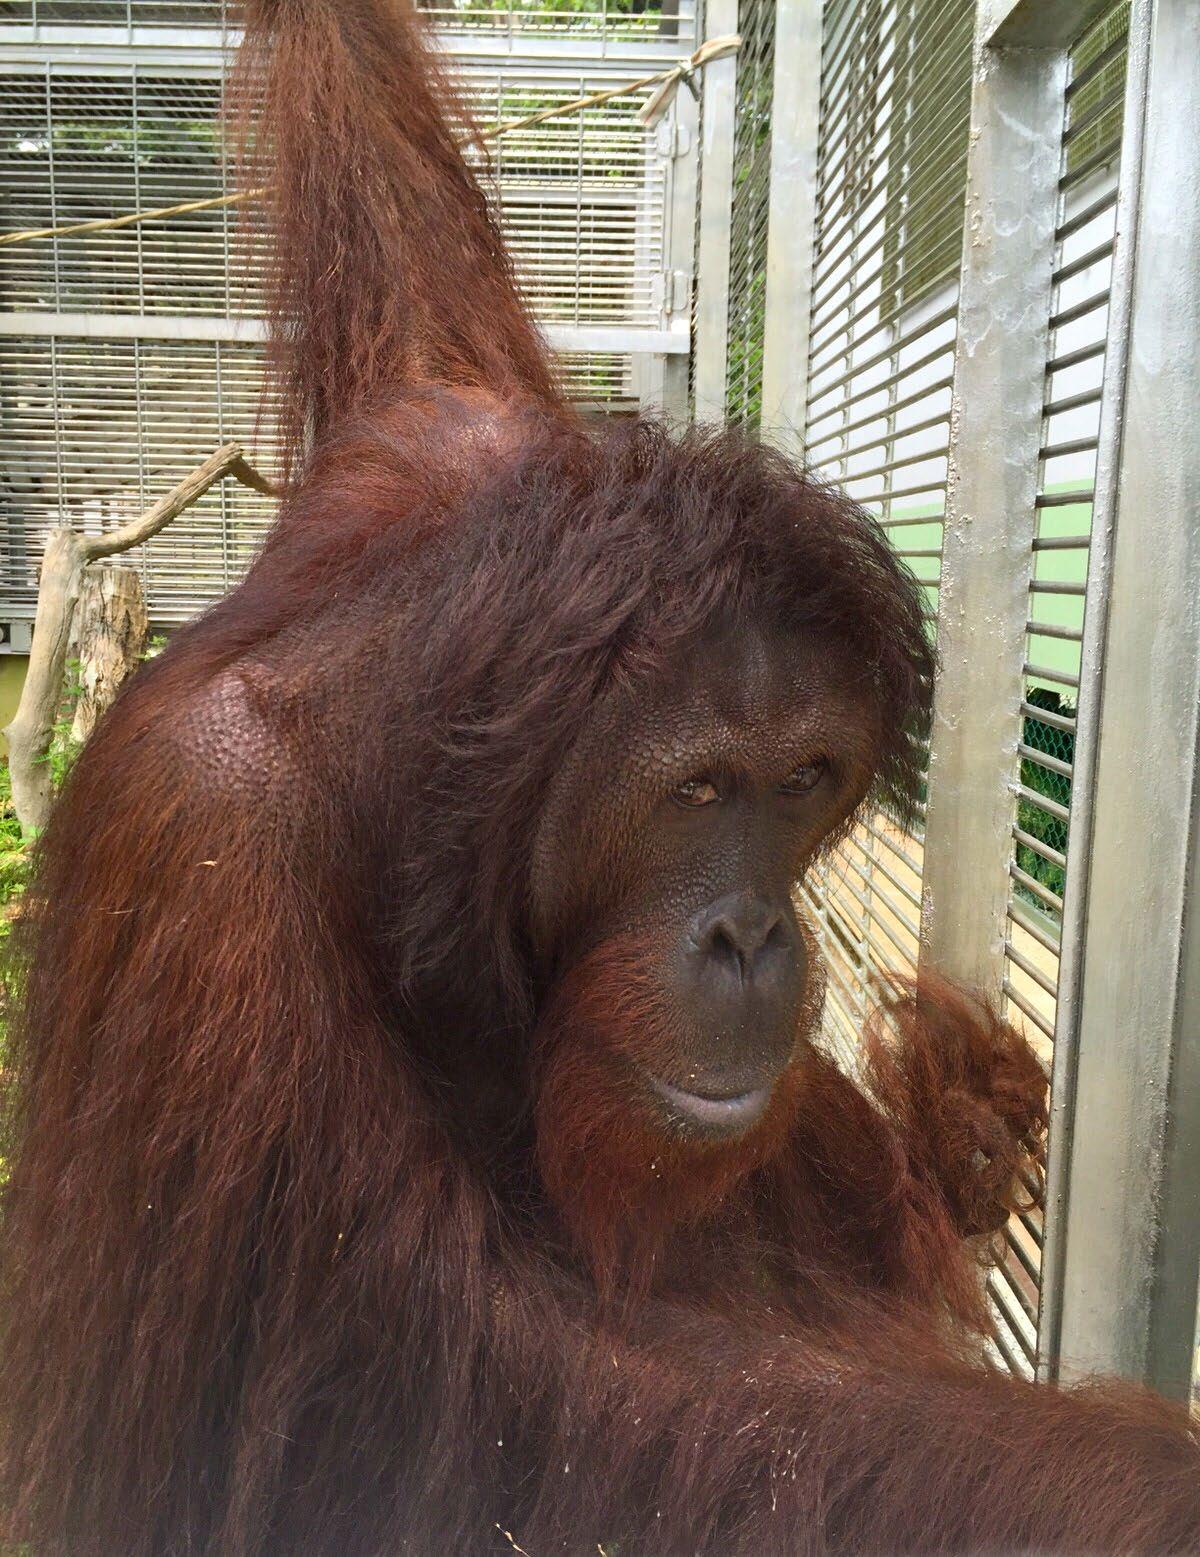 Tiger at the Sepilok Orangutan Rehabilitation Centre